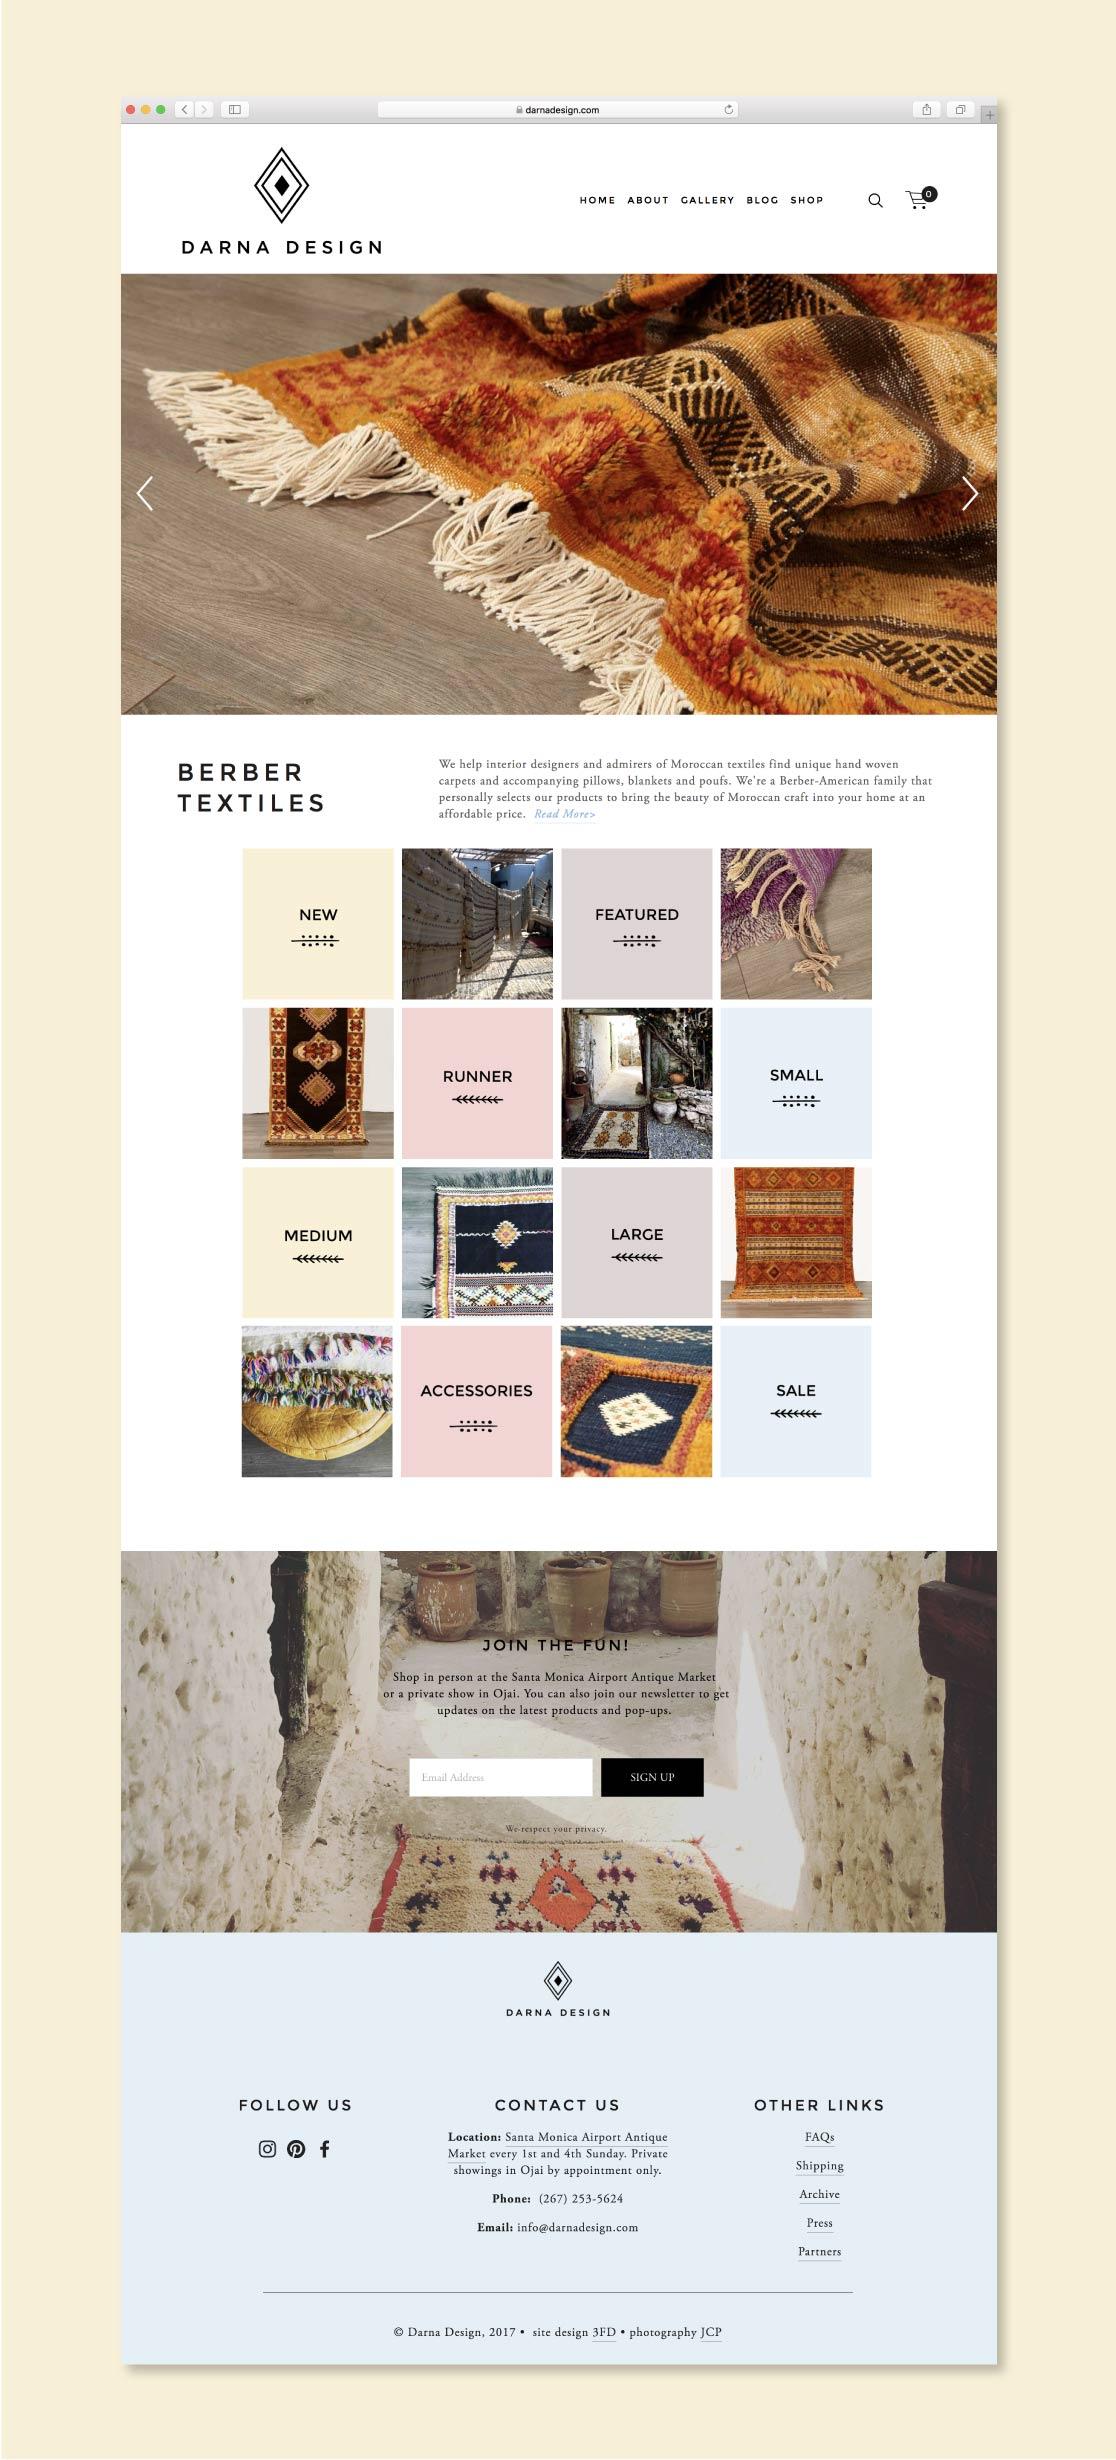 darna-design-morroccan-rugs.jpg